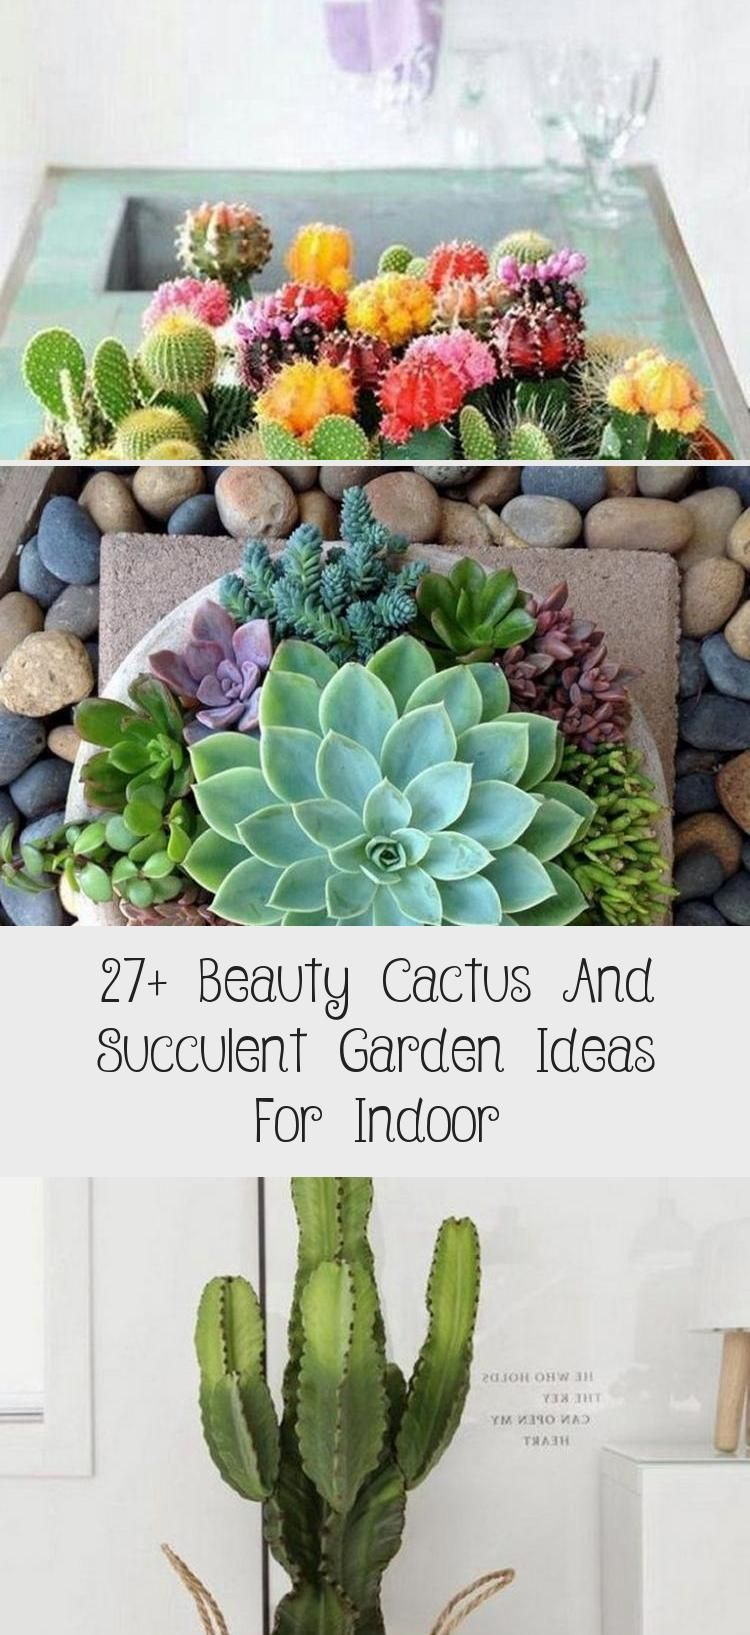 Photo of 27+ Beauty Cactus And Succulent Garden Ideas For Indoor – Backyard İdeas